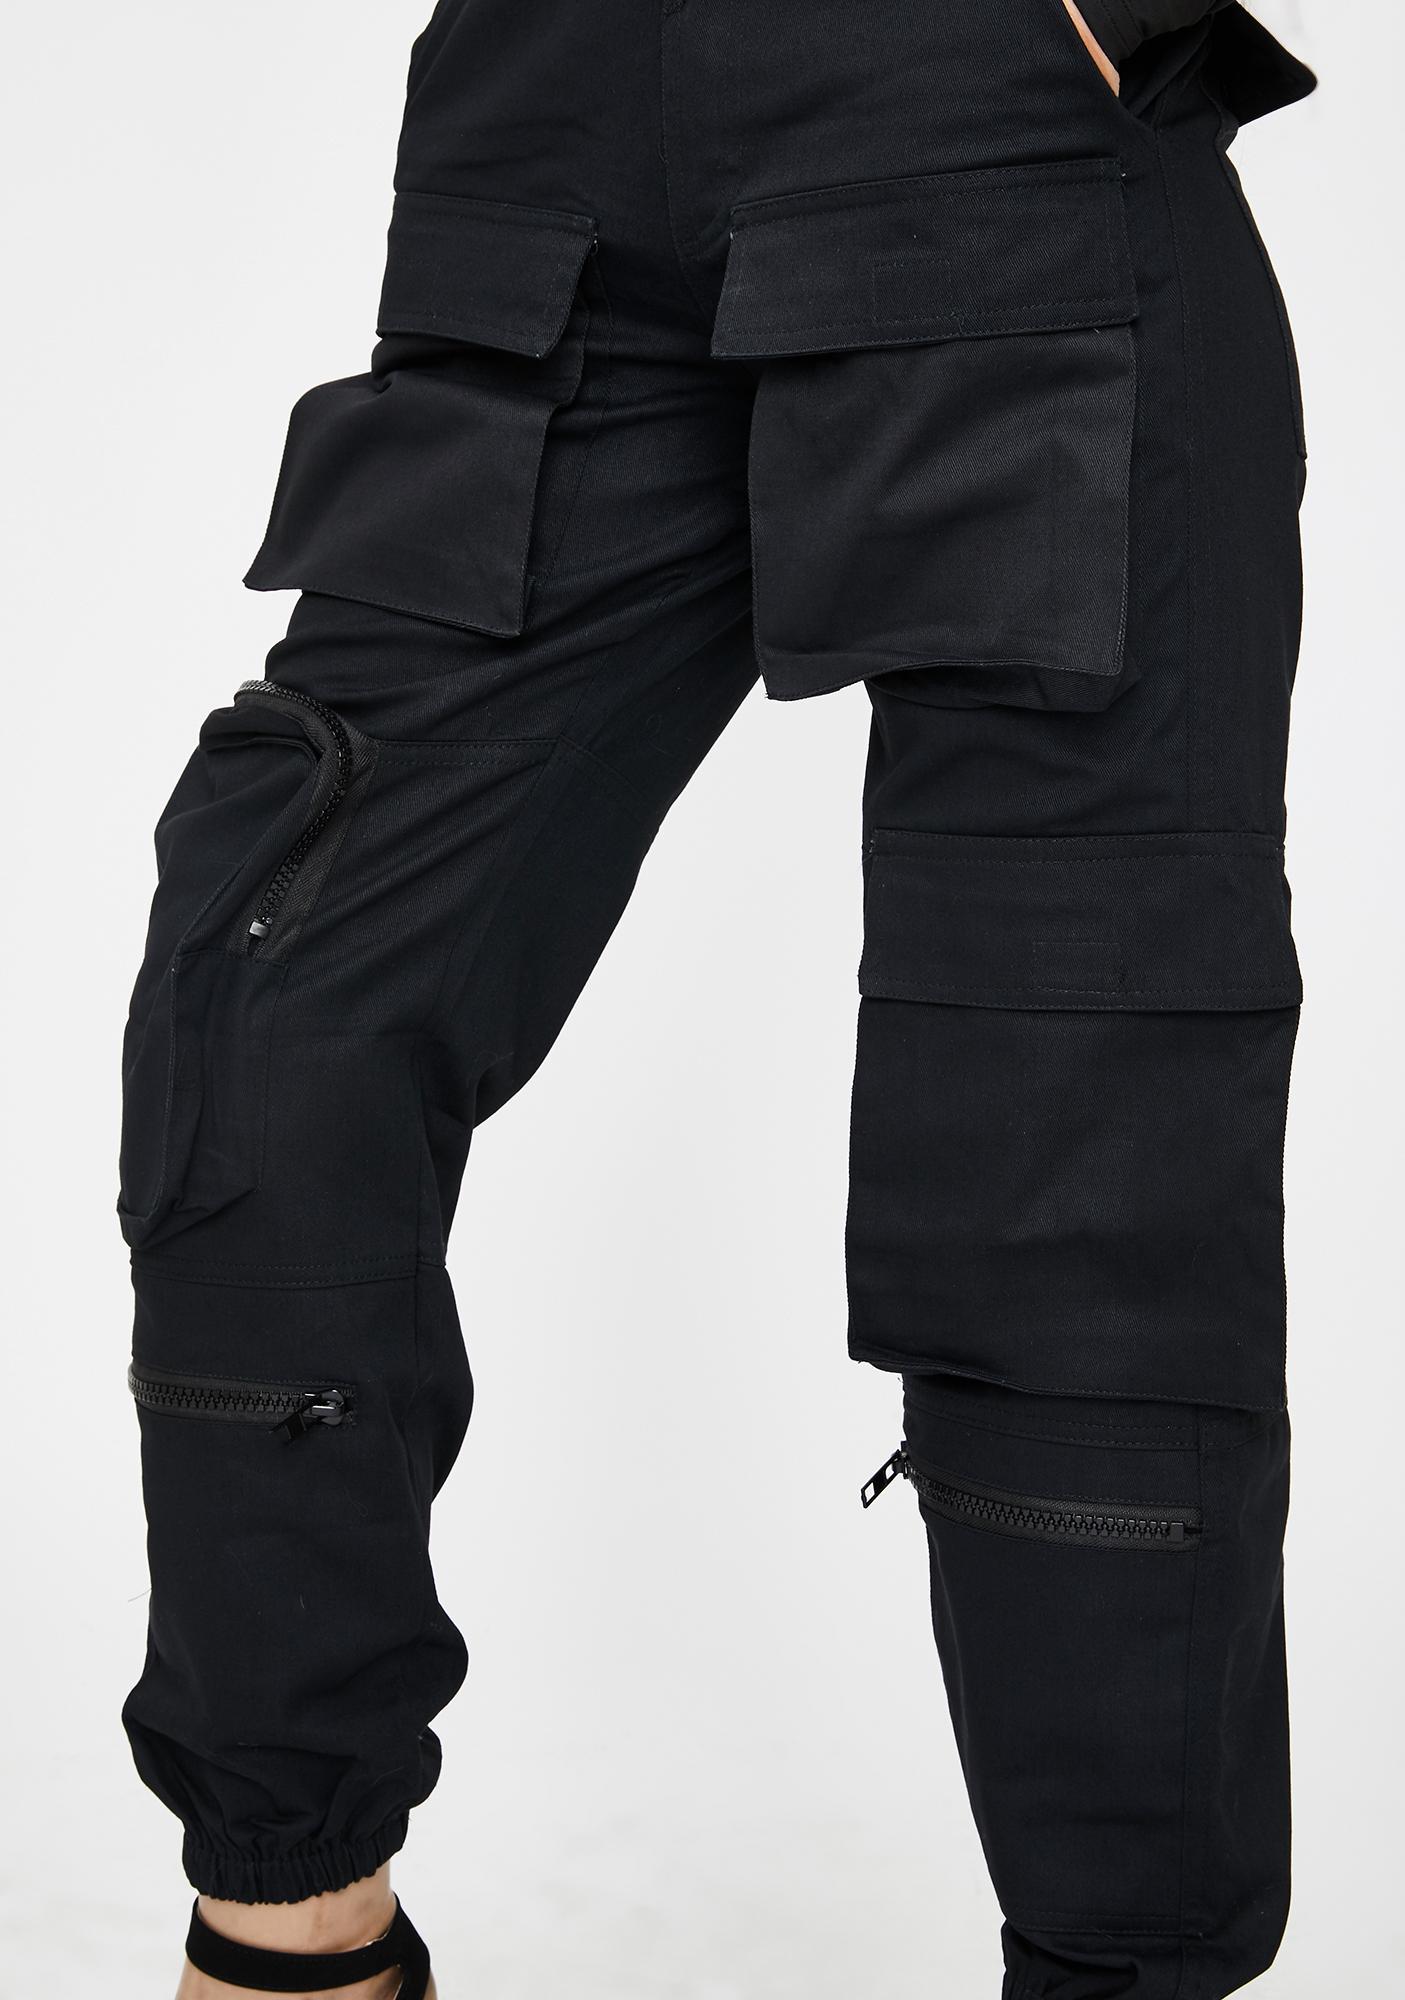 THE KRIPT Black Slayer Pockets Pants